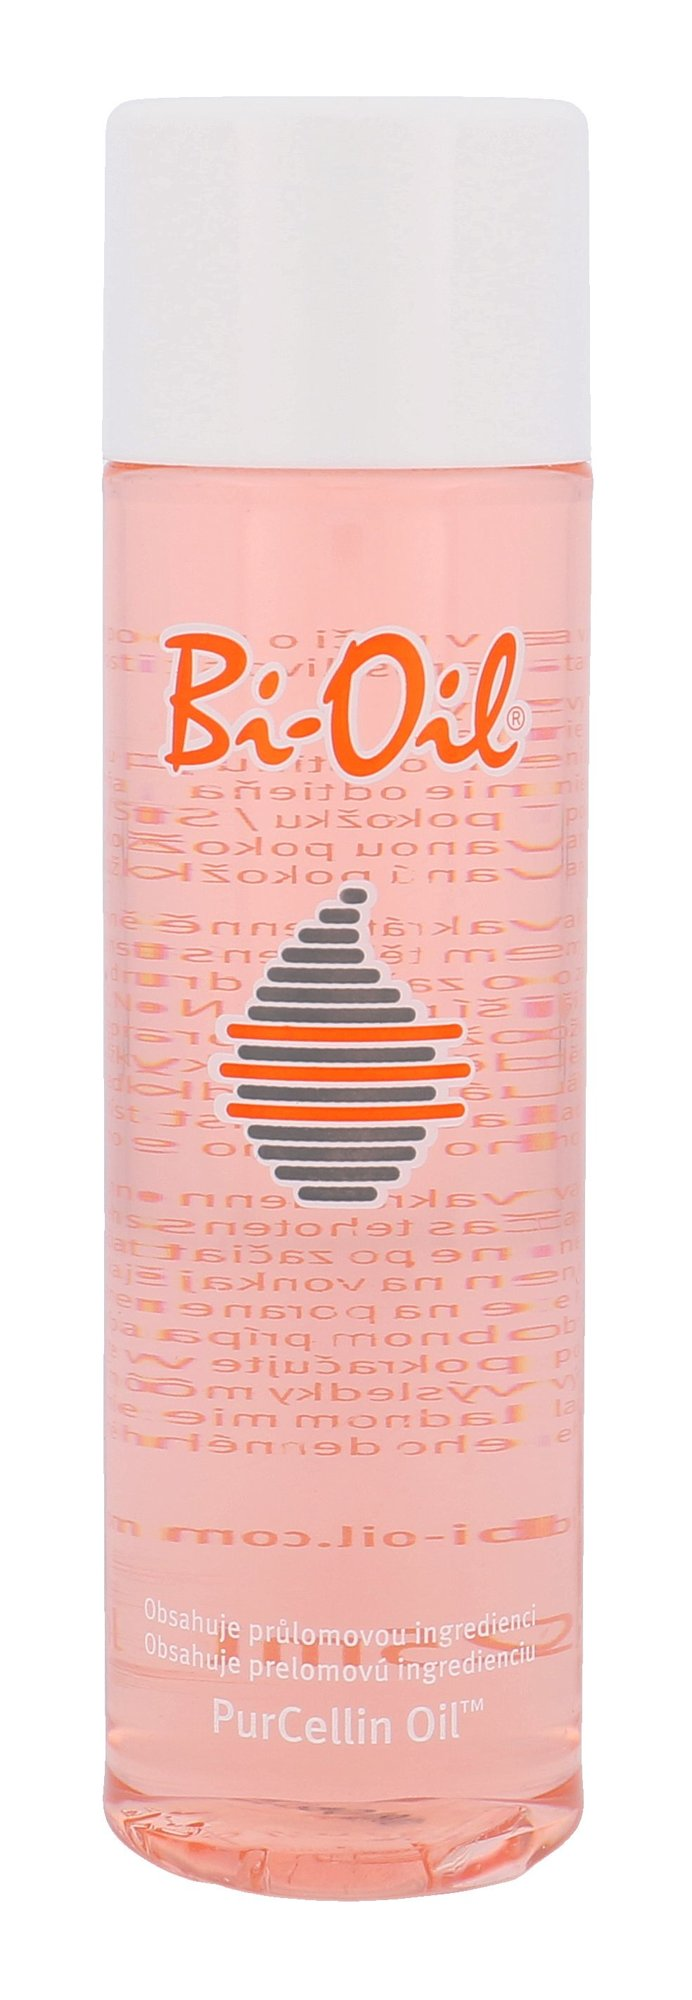 Bi-Oil PurCellin Oil Cellulite and Stretch Marks 125ml